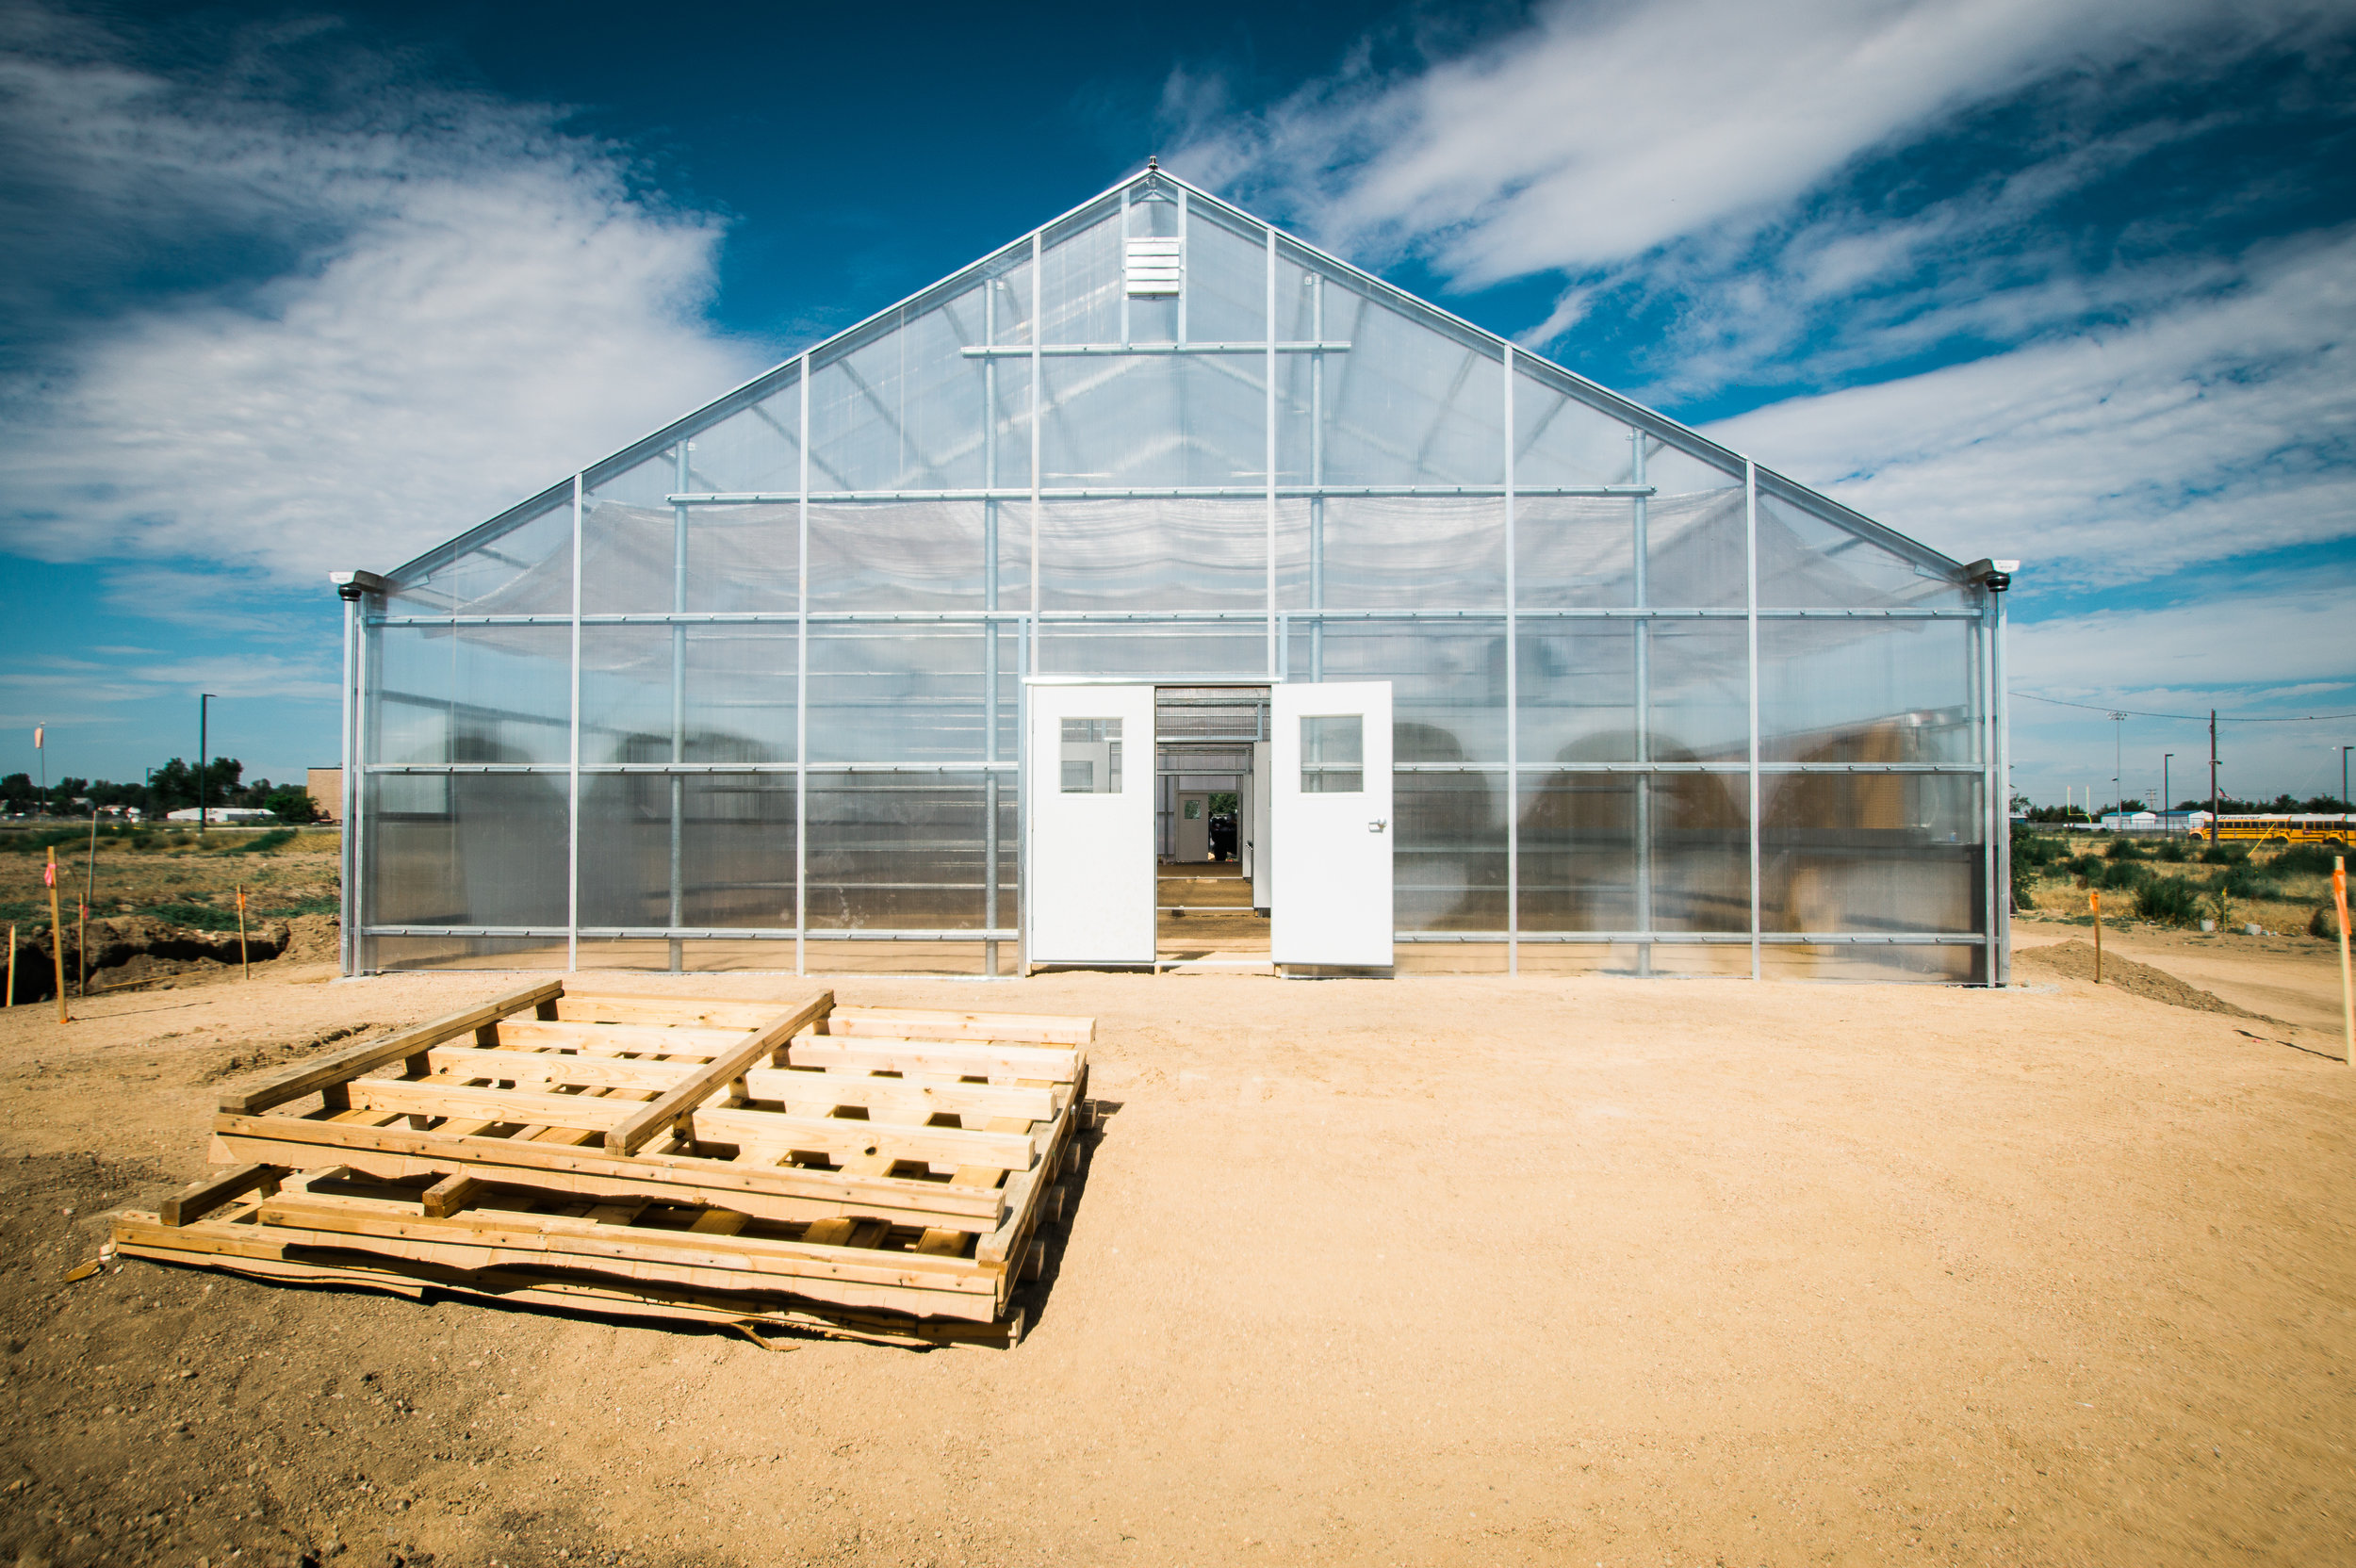 Photo Credit: Jeff Nardoni (Eclipse Greenhouse Construction)